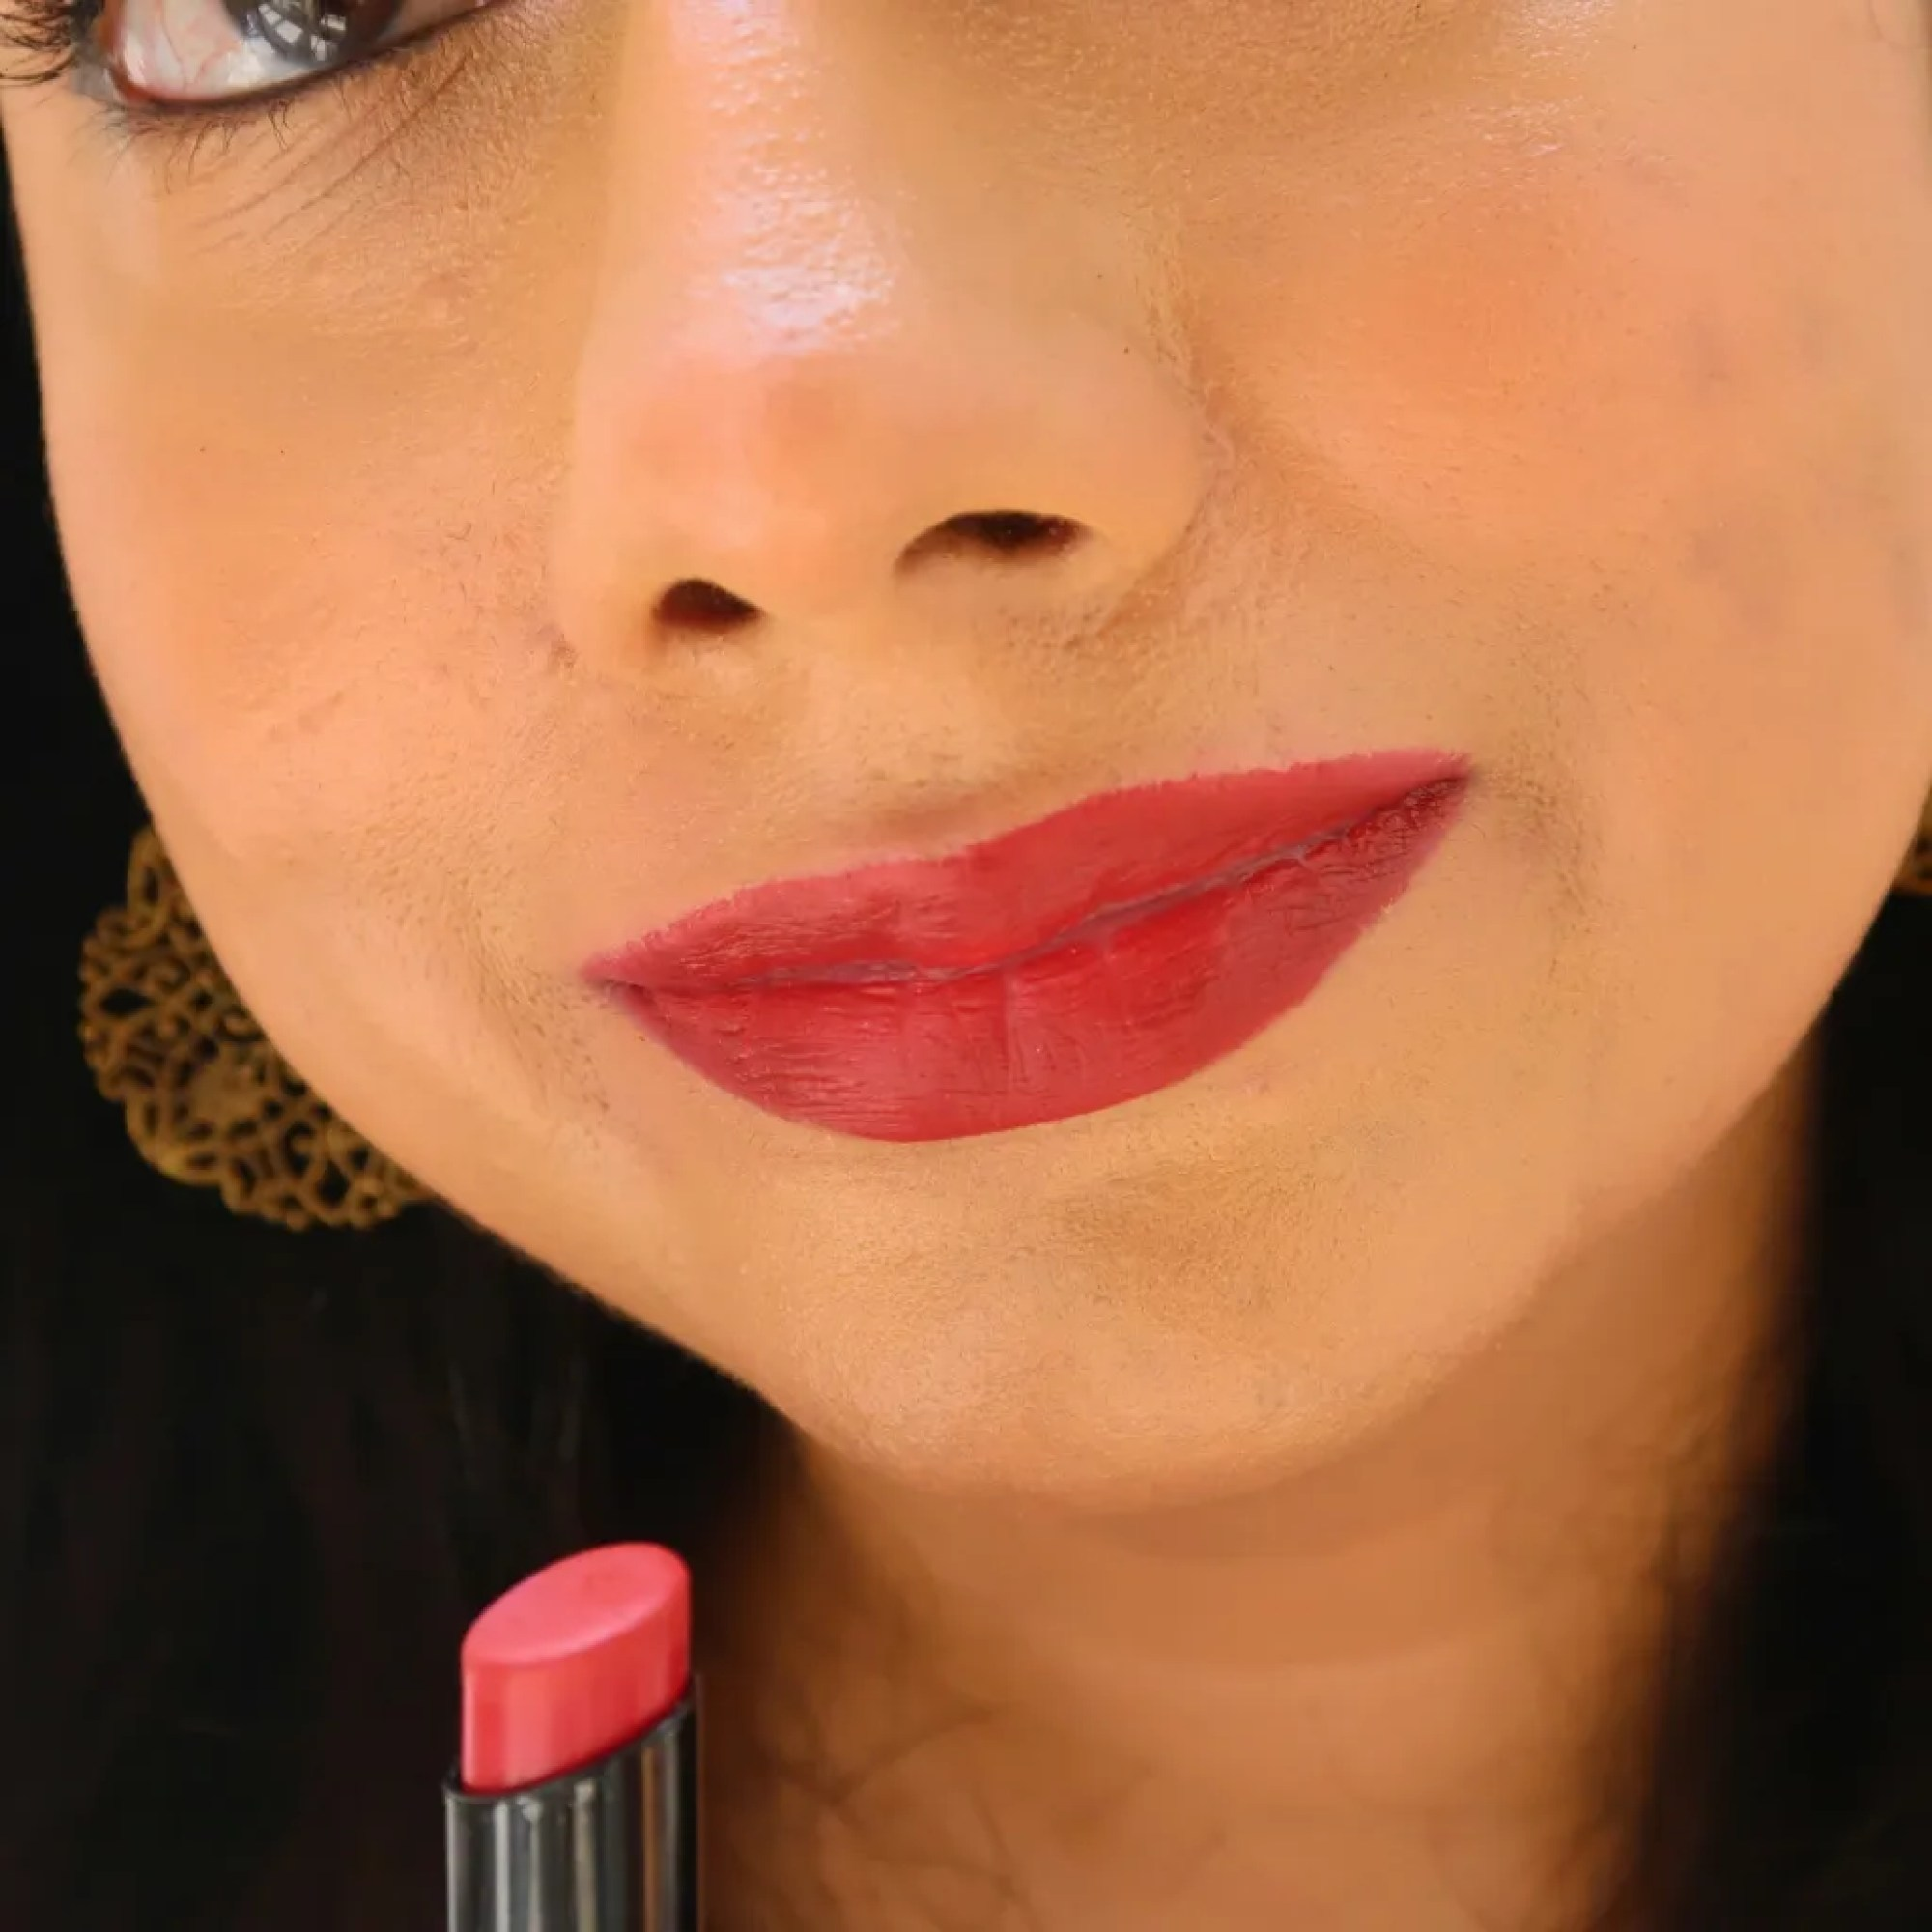 Spekta True Matte Lipstick - Saucy on NC35 skin tone